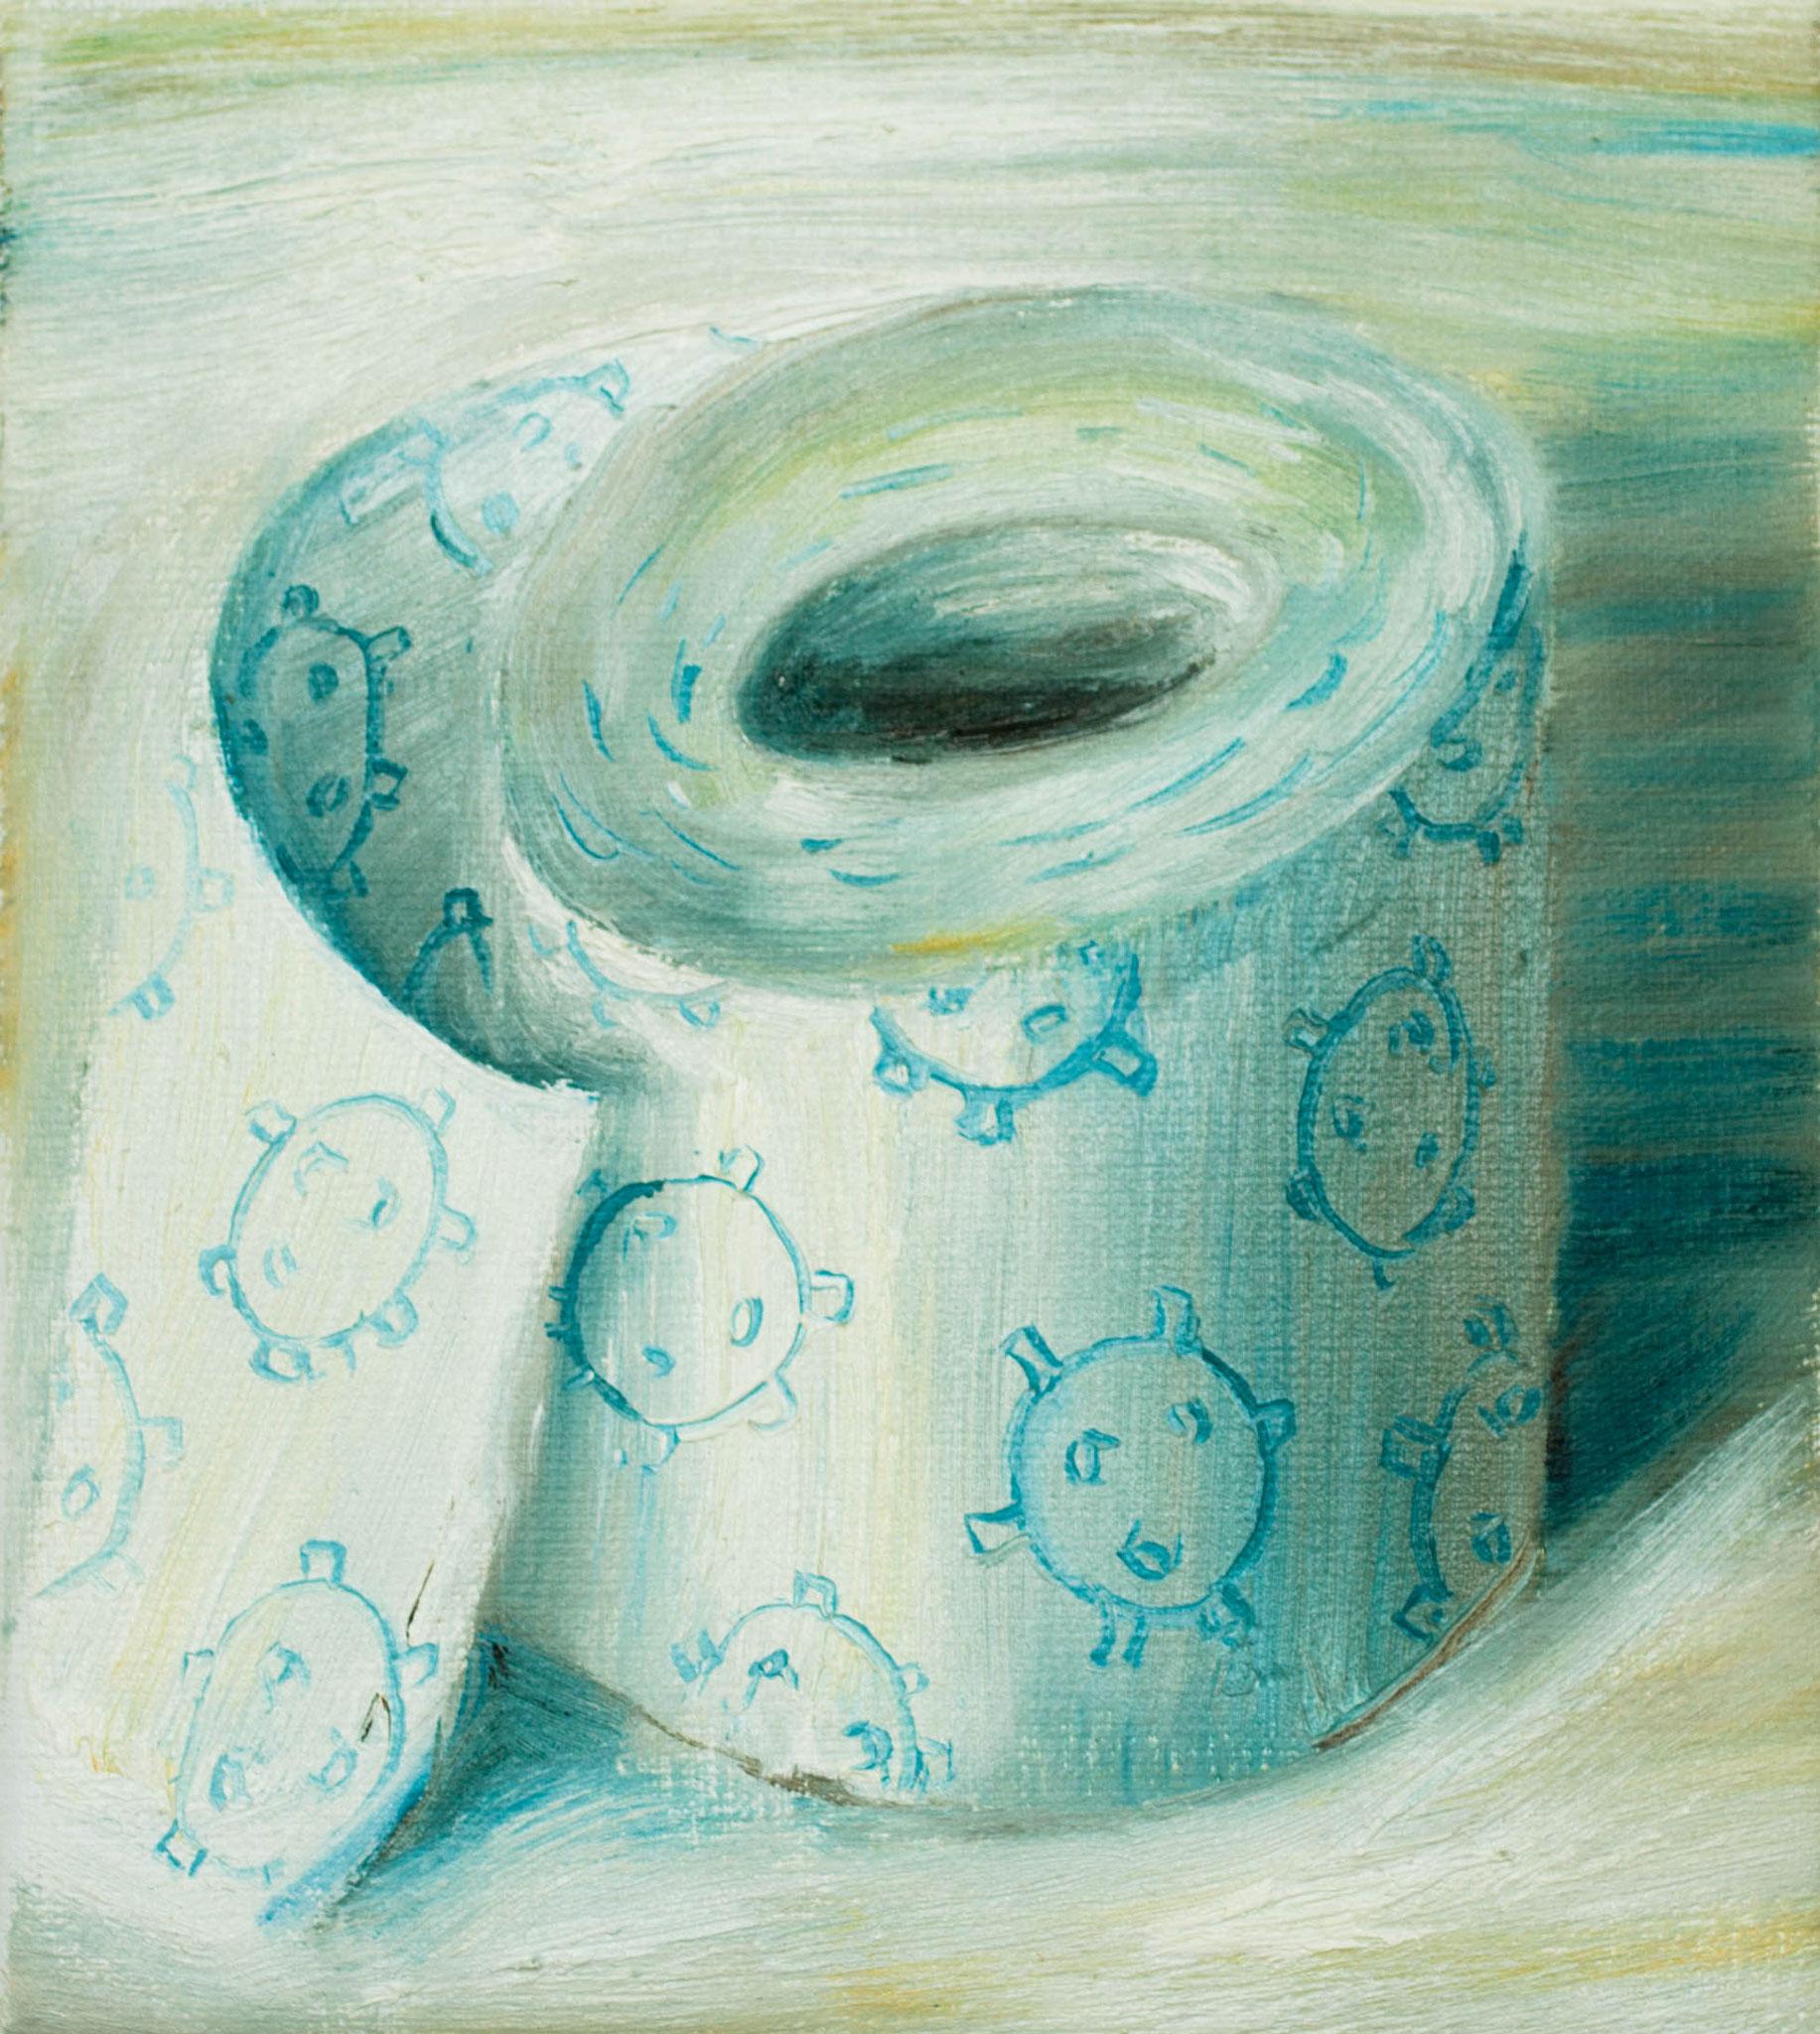 Toiletpaper with corona